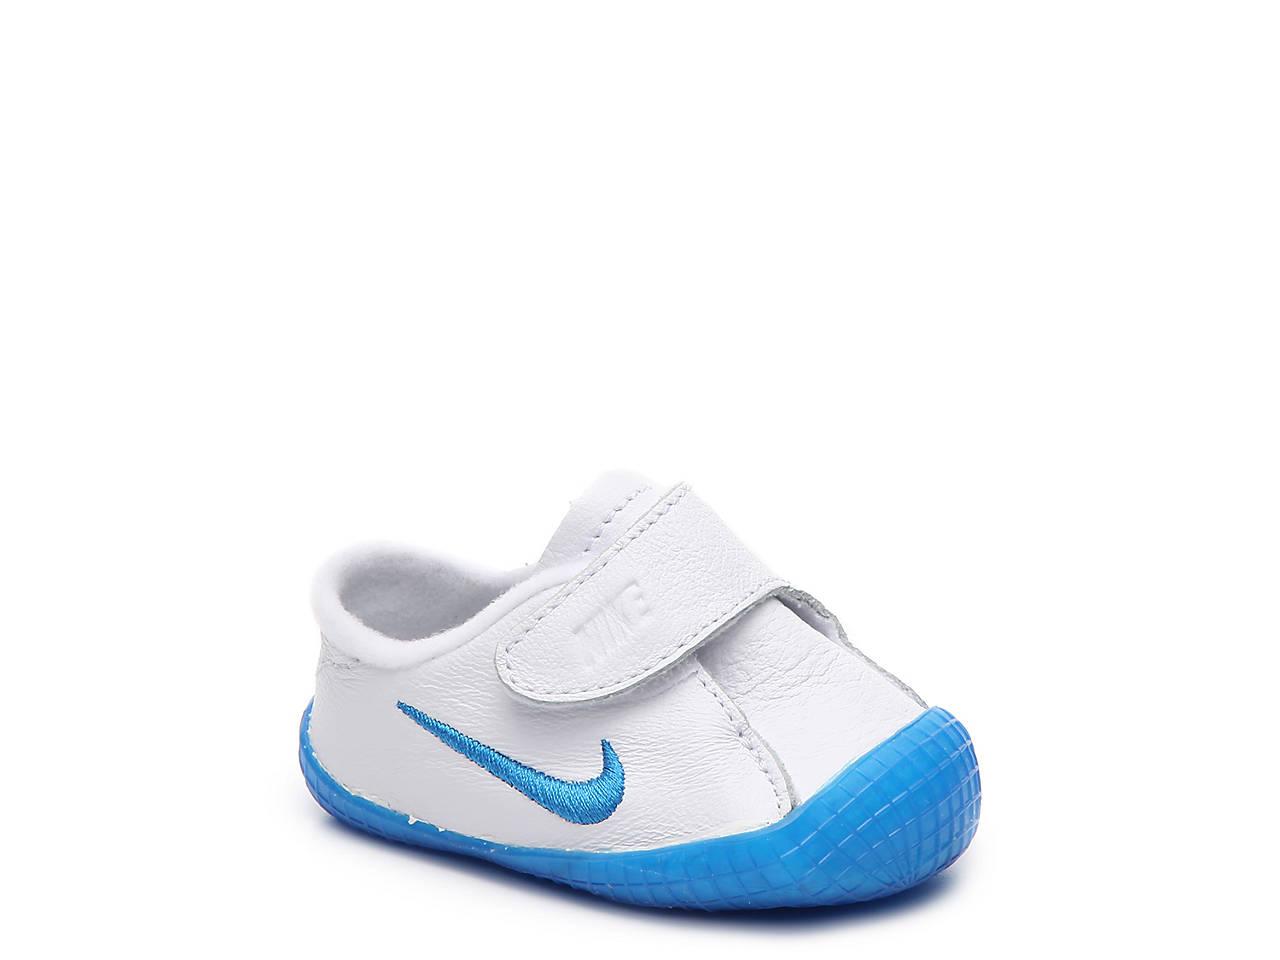 5ff1ed7e4593c1 Nike Waffle Infant Crib Shoe Kids Shoes